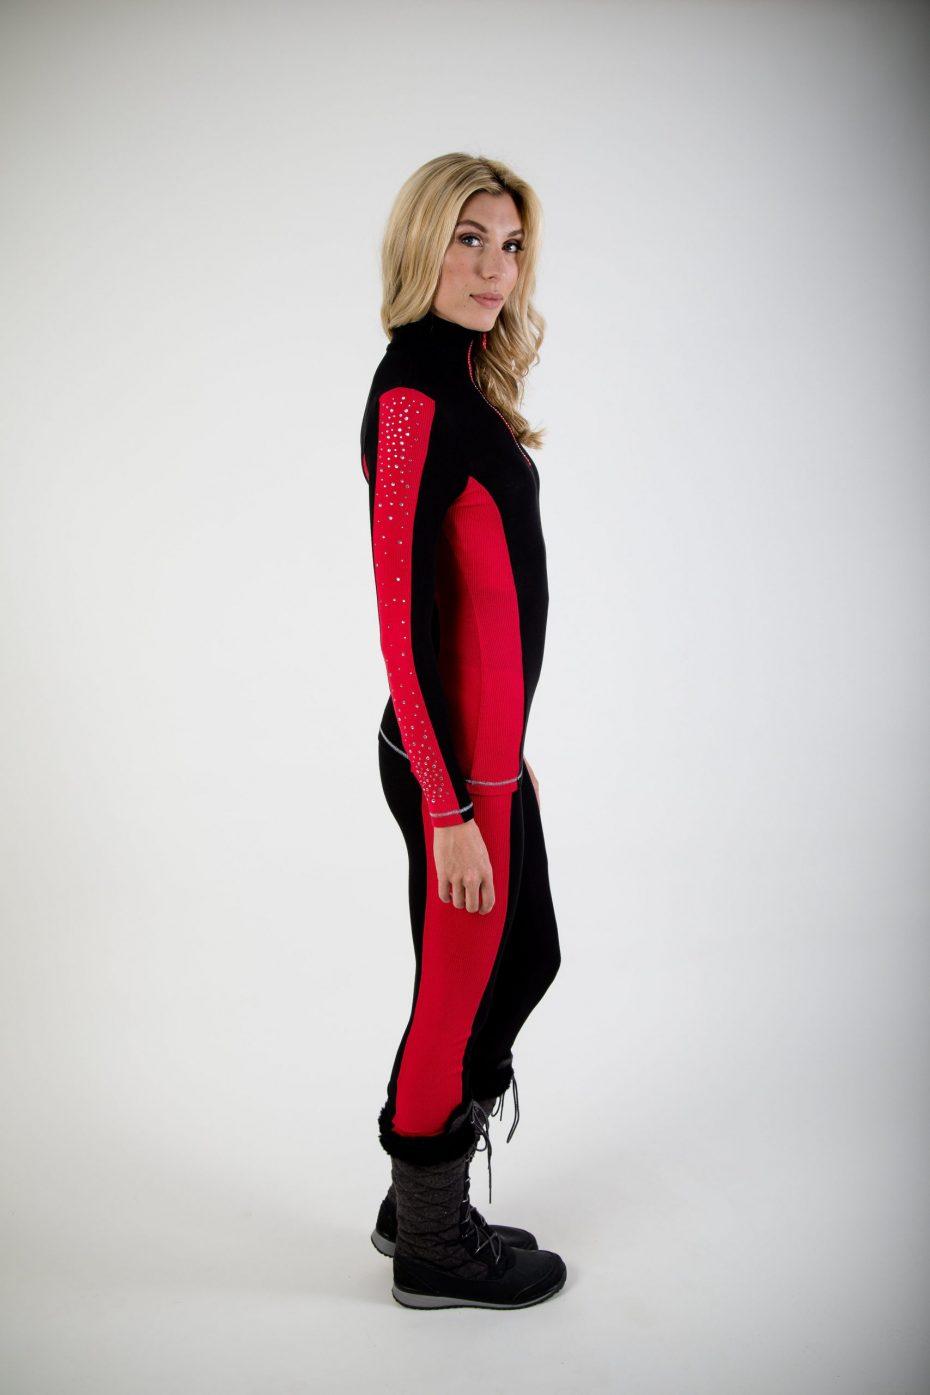 S'No Queen: Doublestriper Zip Polo: Black & Red: -673